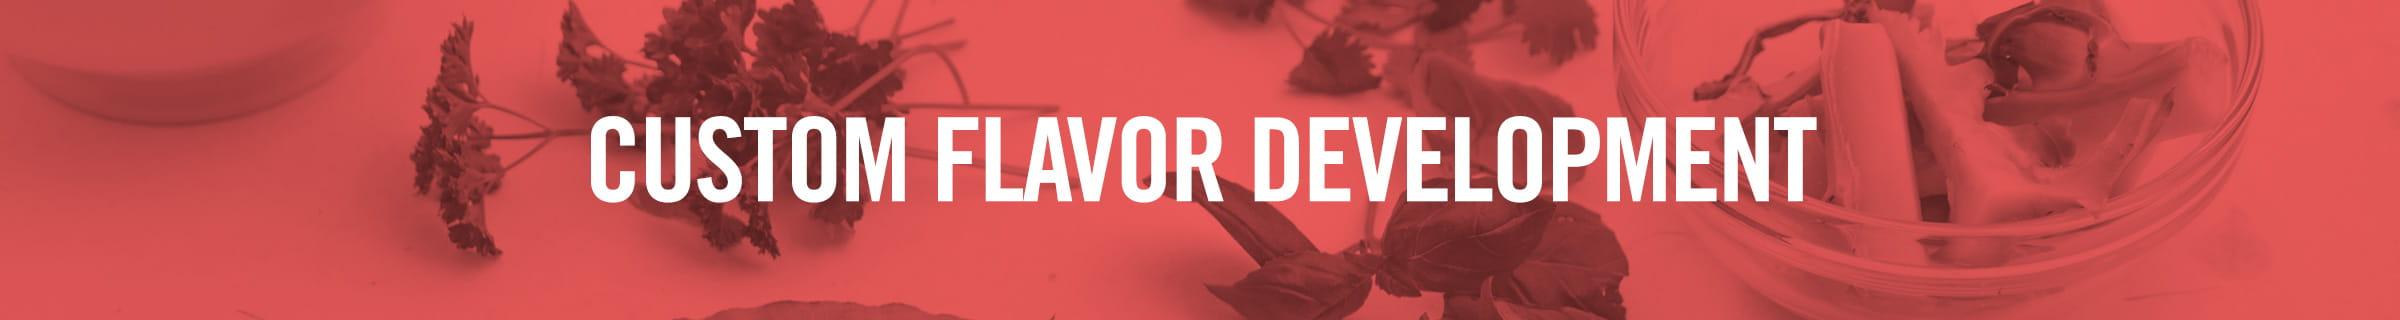 Parsley- Custom flavor development